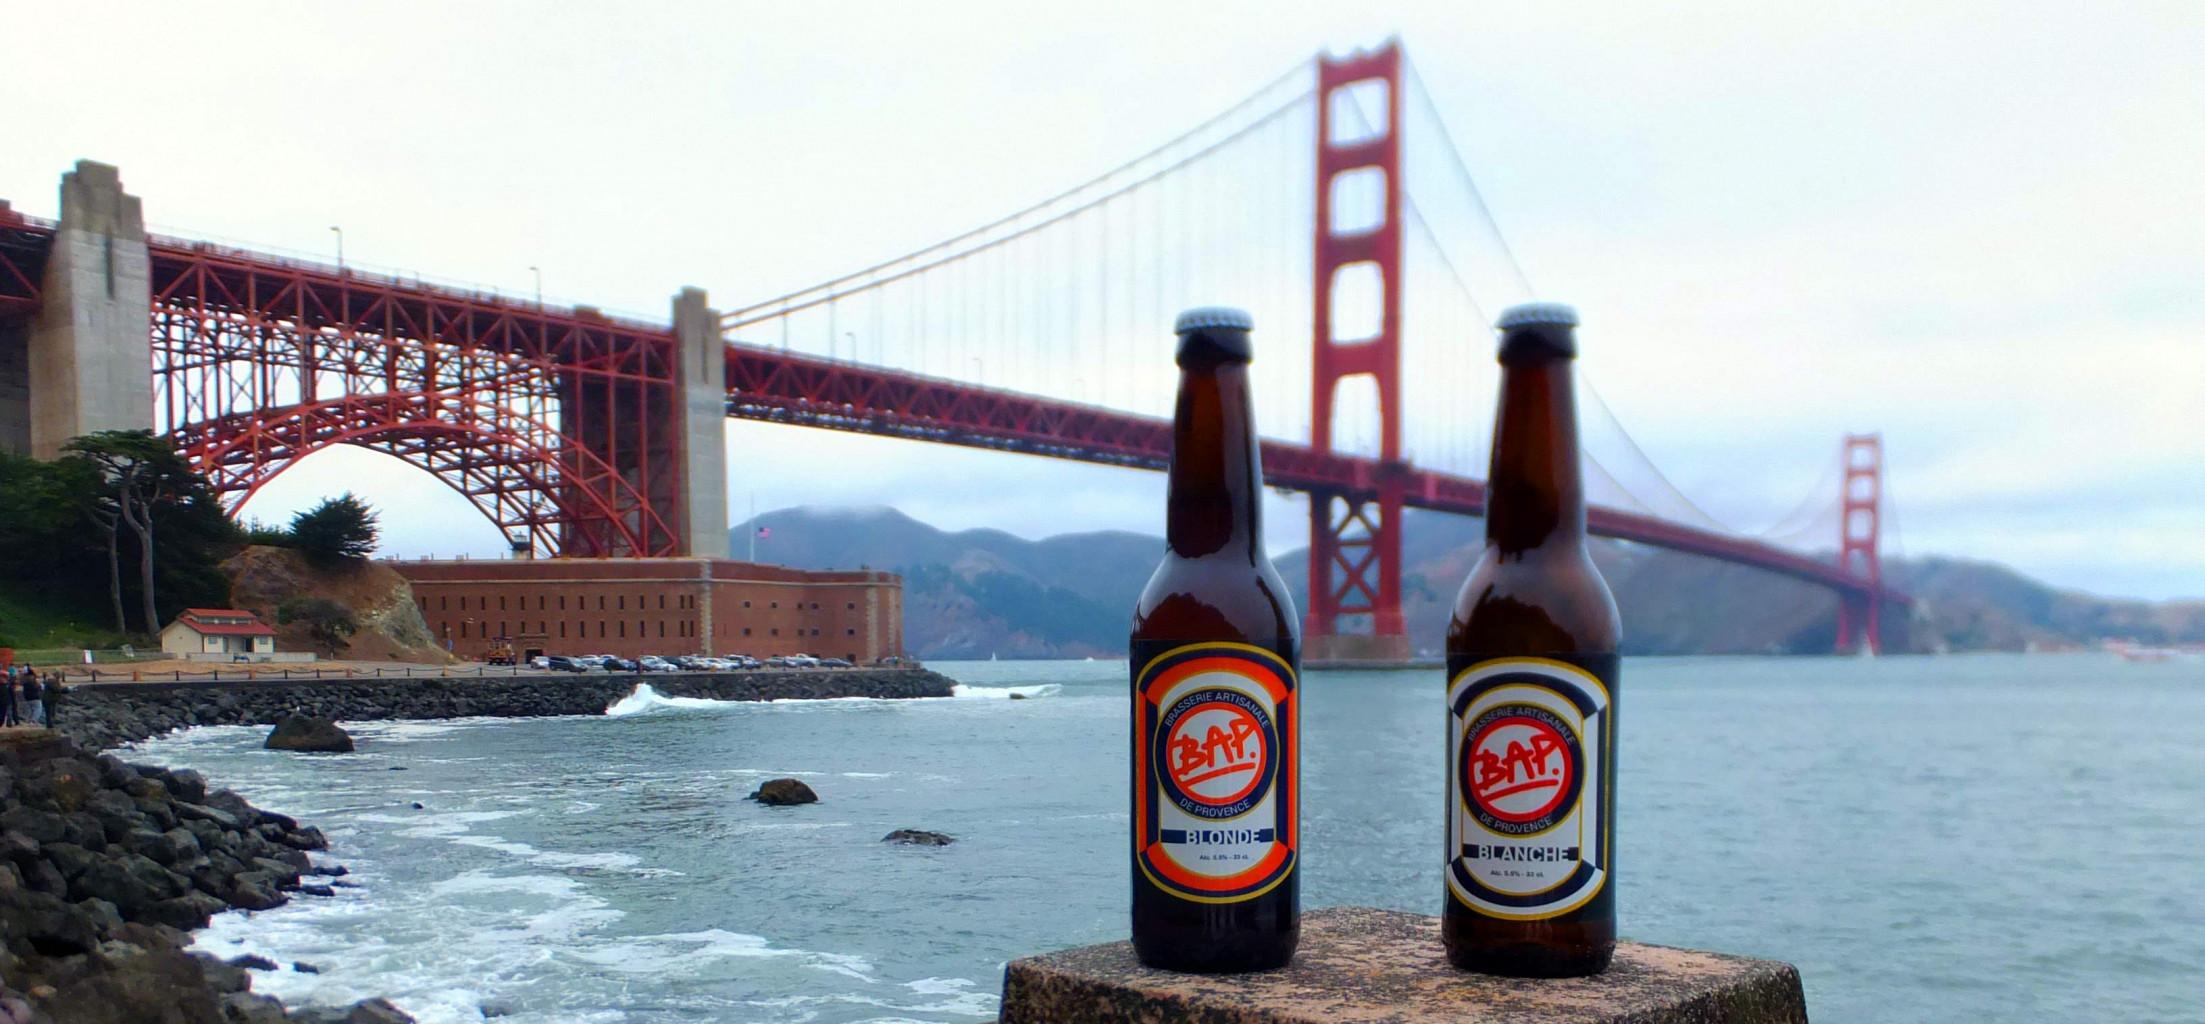 BAP Golden Gate San Francisco